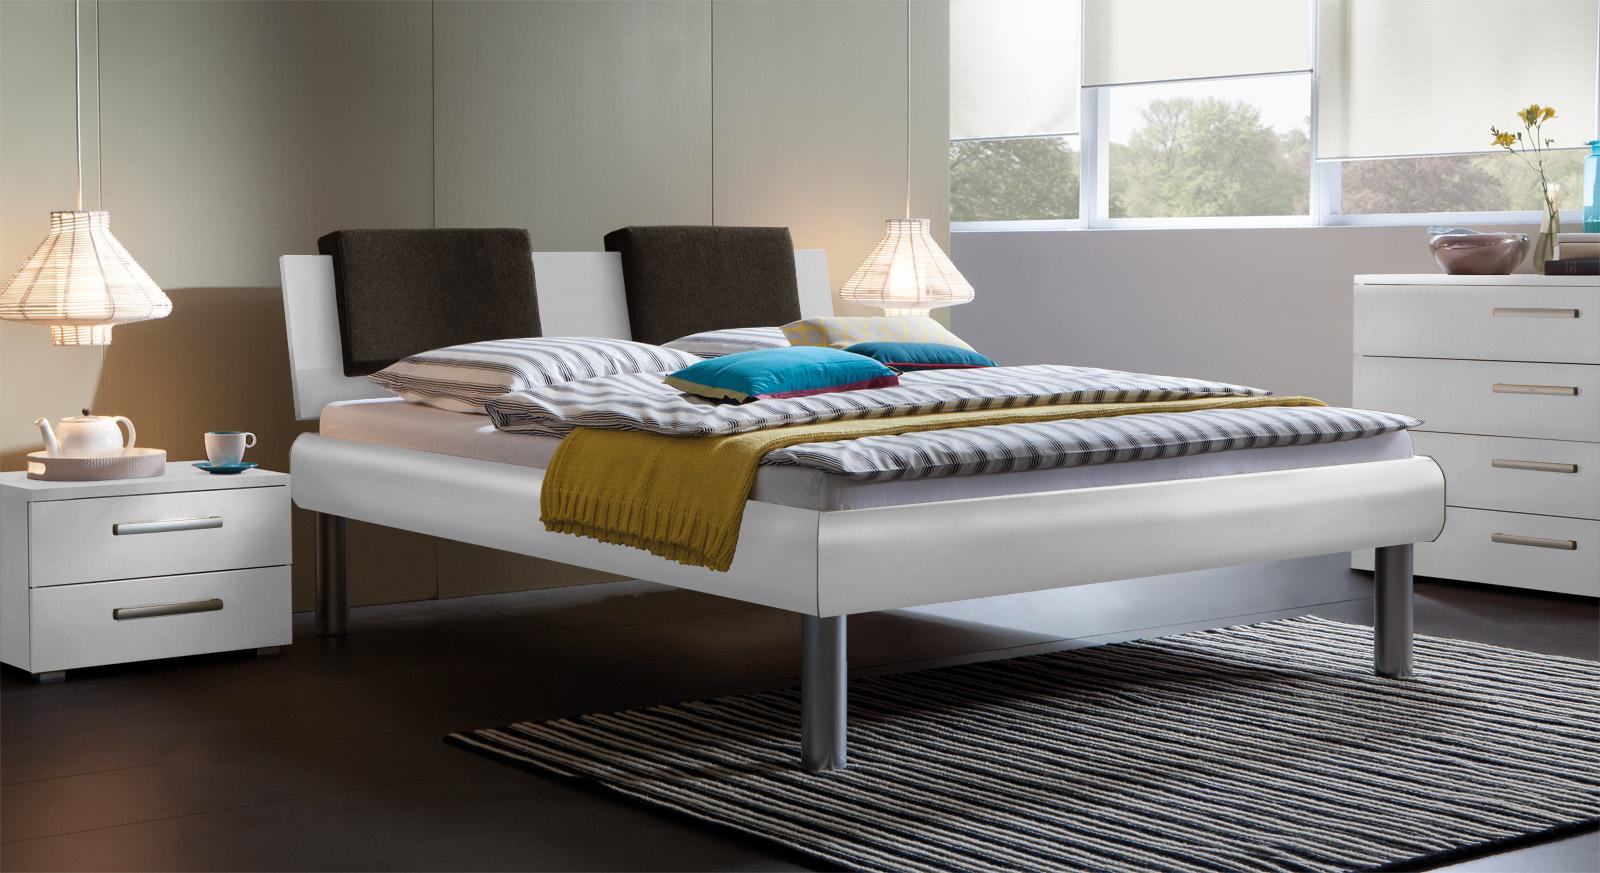 Full Size of Poco Betten Bett 120x200 Weiß Luxus 160 Feng Shui Japanisches 1 40 Stapelbar Mit Aufbewahrung Erhöhtes Runde 160x200 Komplett Kopfteil Selber Machen 140x220 Bett Bett 200x200 Komforthöhe